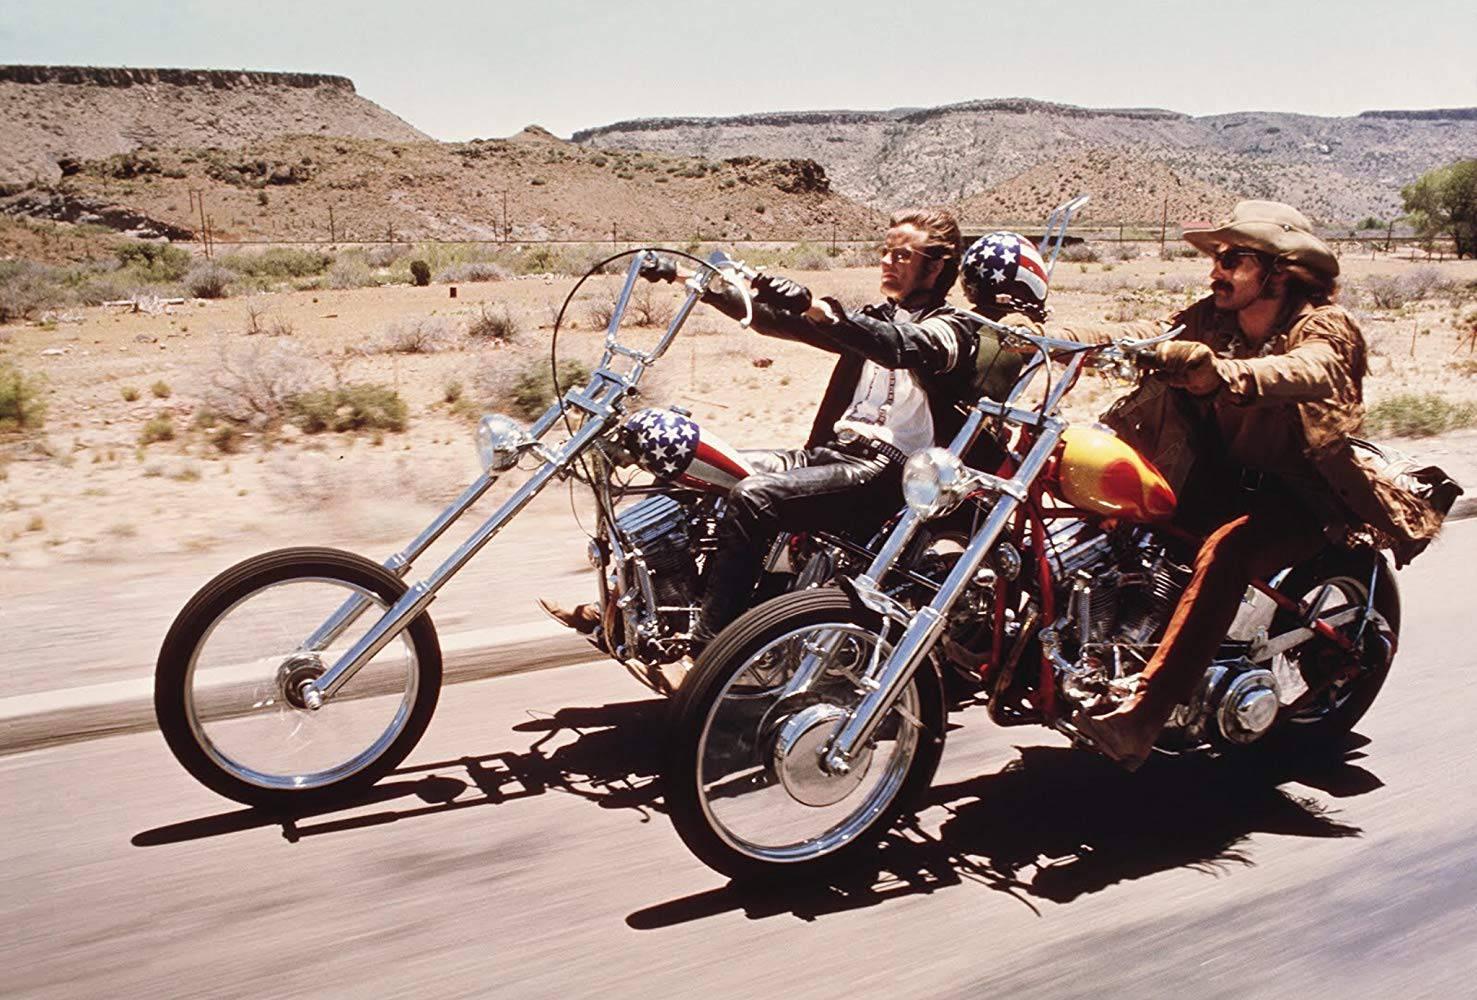 Filmski hippie klasik zamalo je 'ubio' Hollywood kakvog znamo